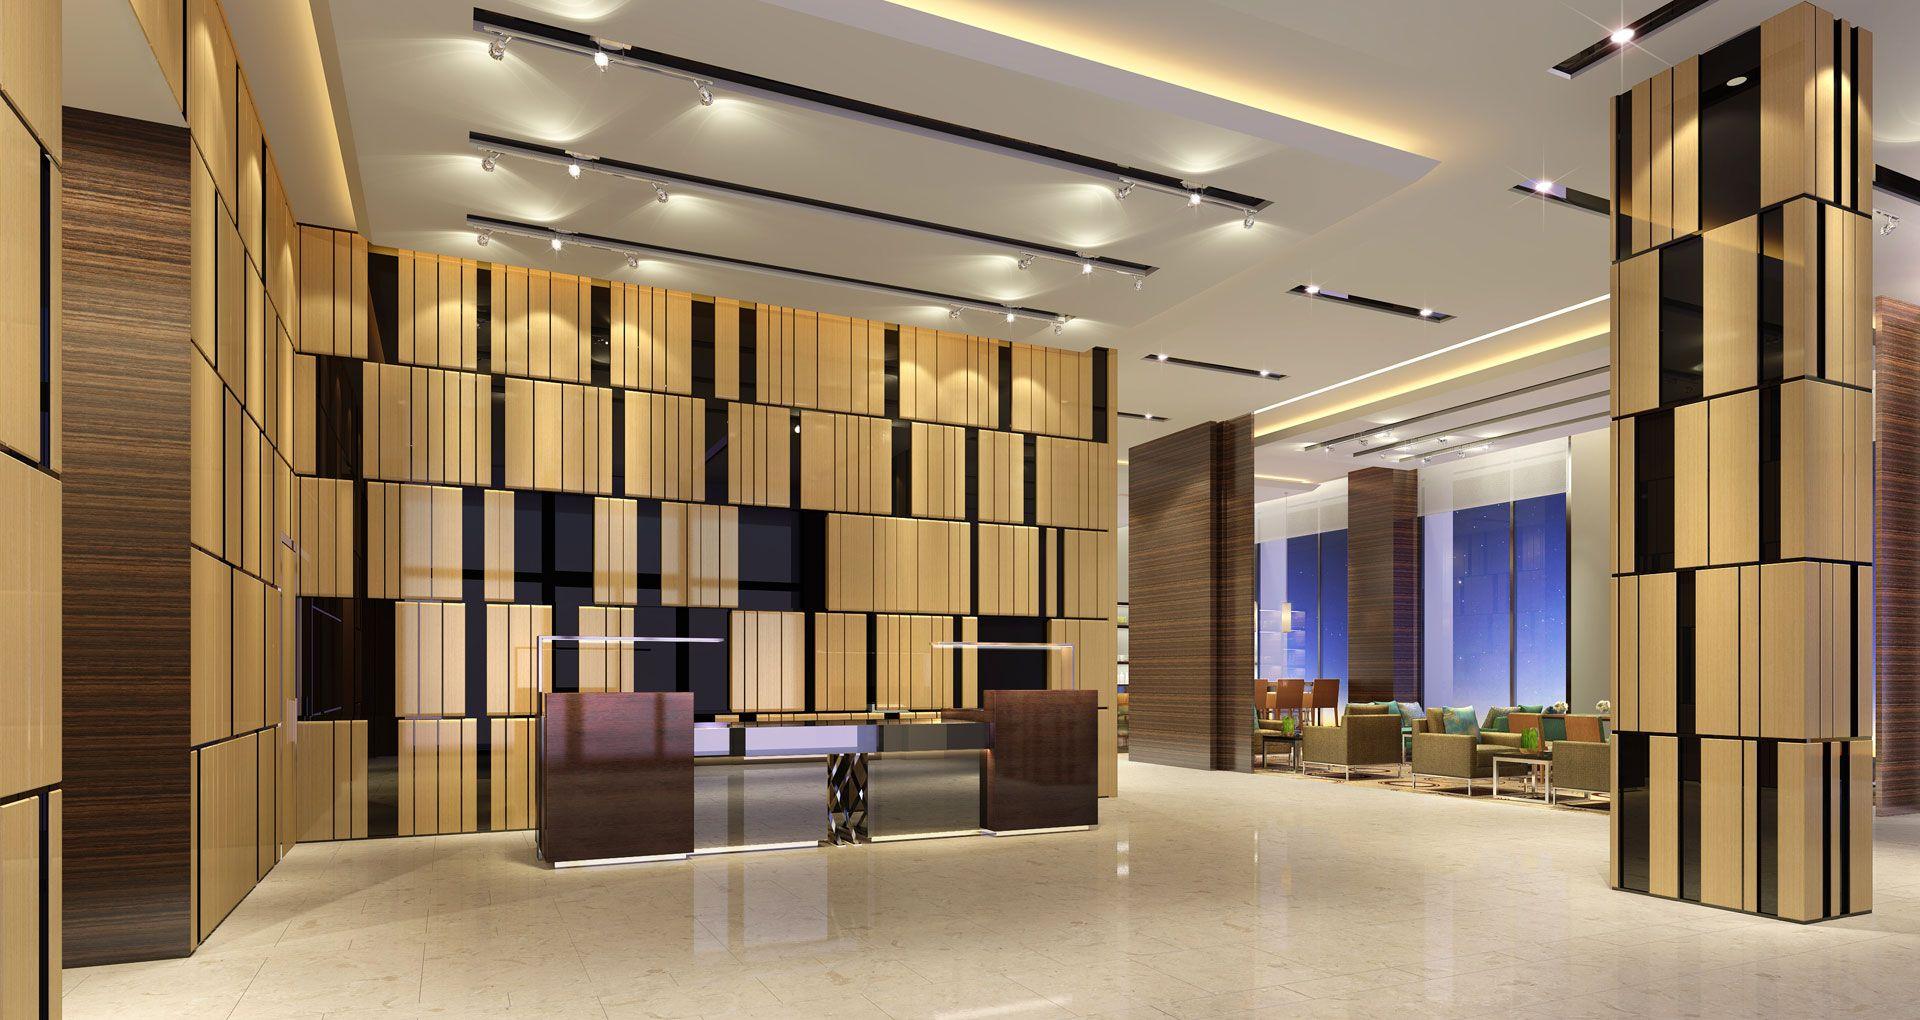 Hba design studio hba interior design fairfiled for Design hotel usa